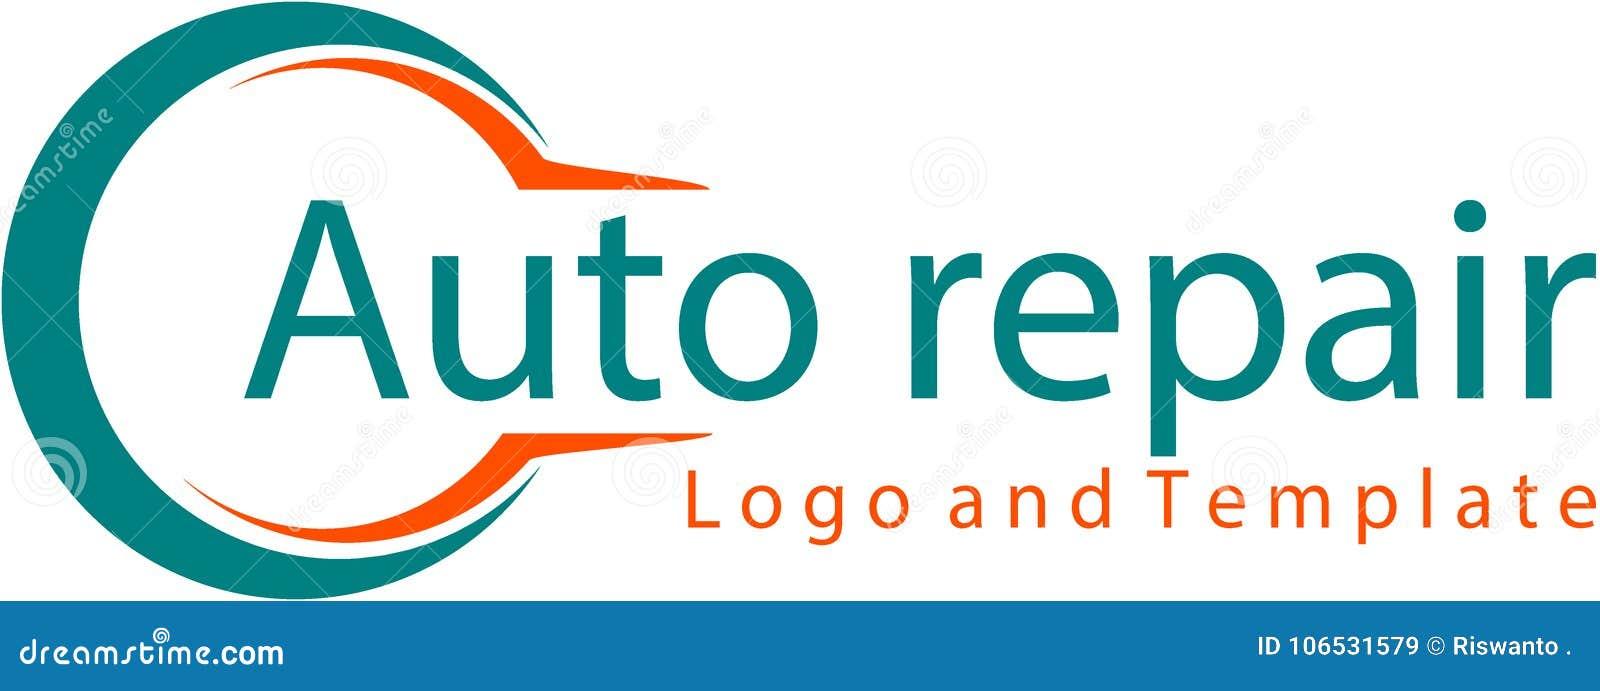 auto repair logo and template stock illustration illustration of rh dreamstime com  automotive repair logo template